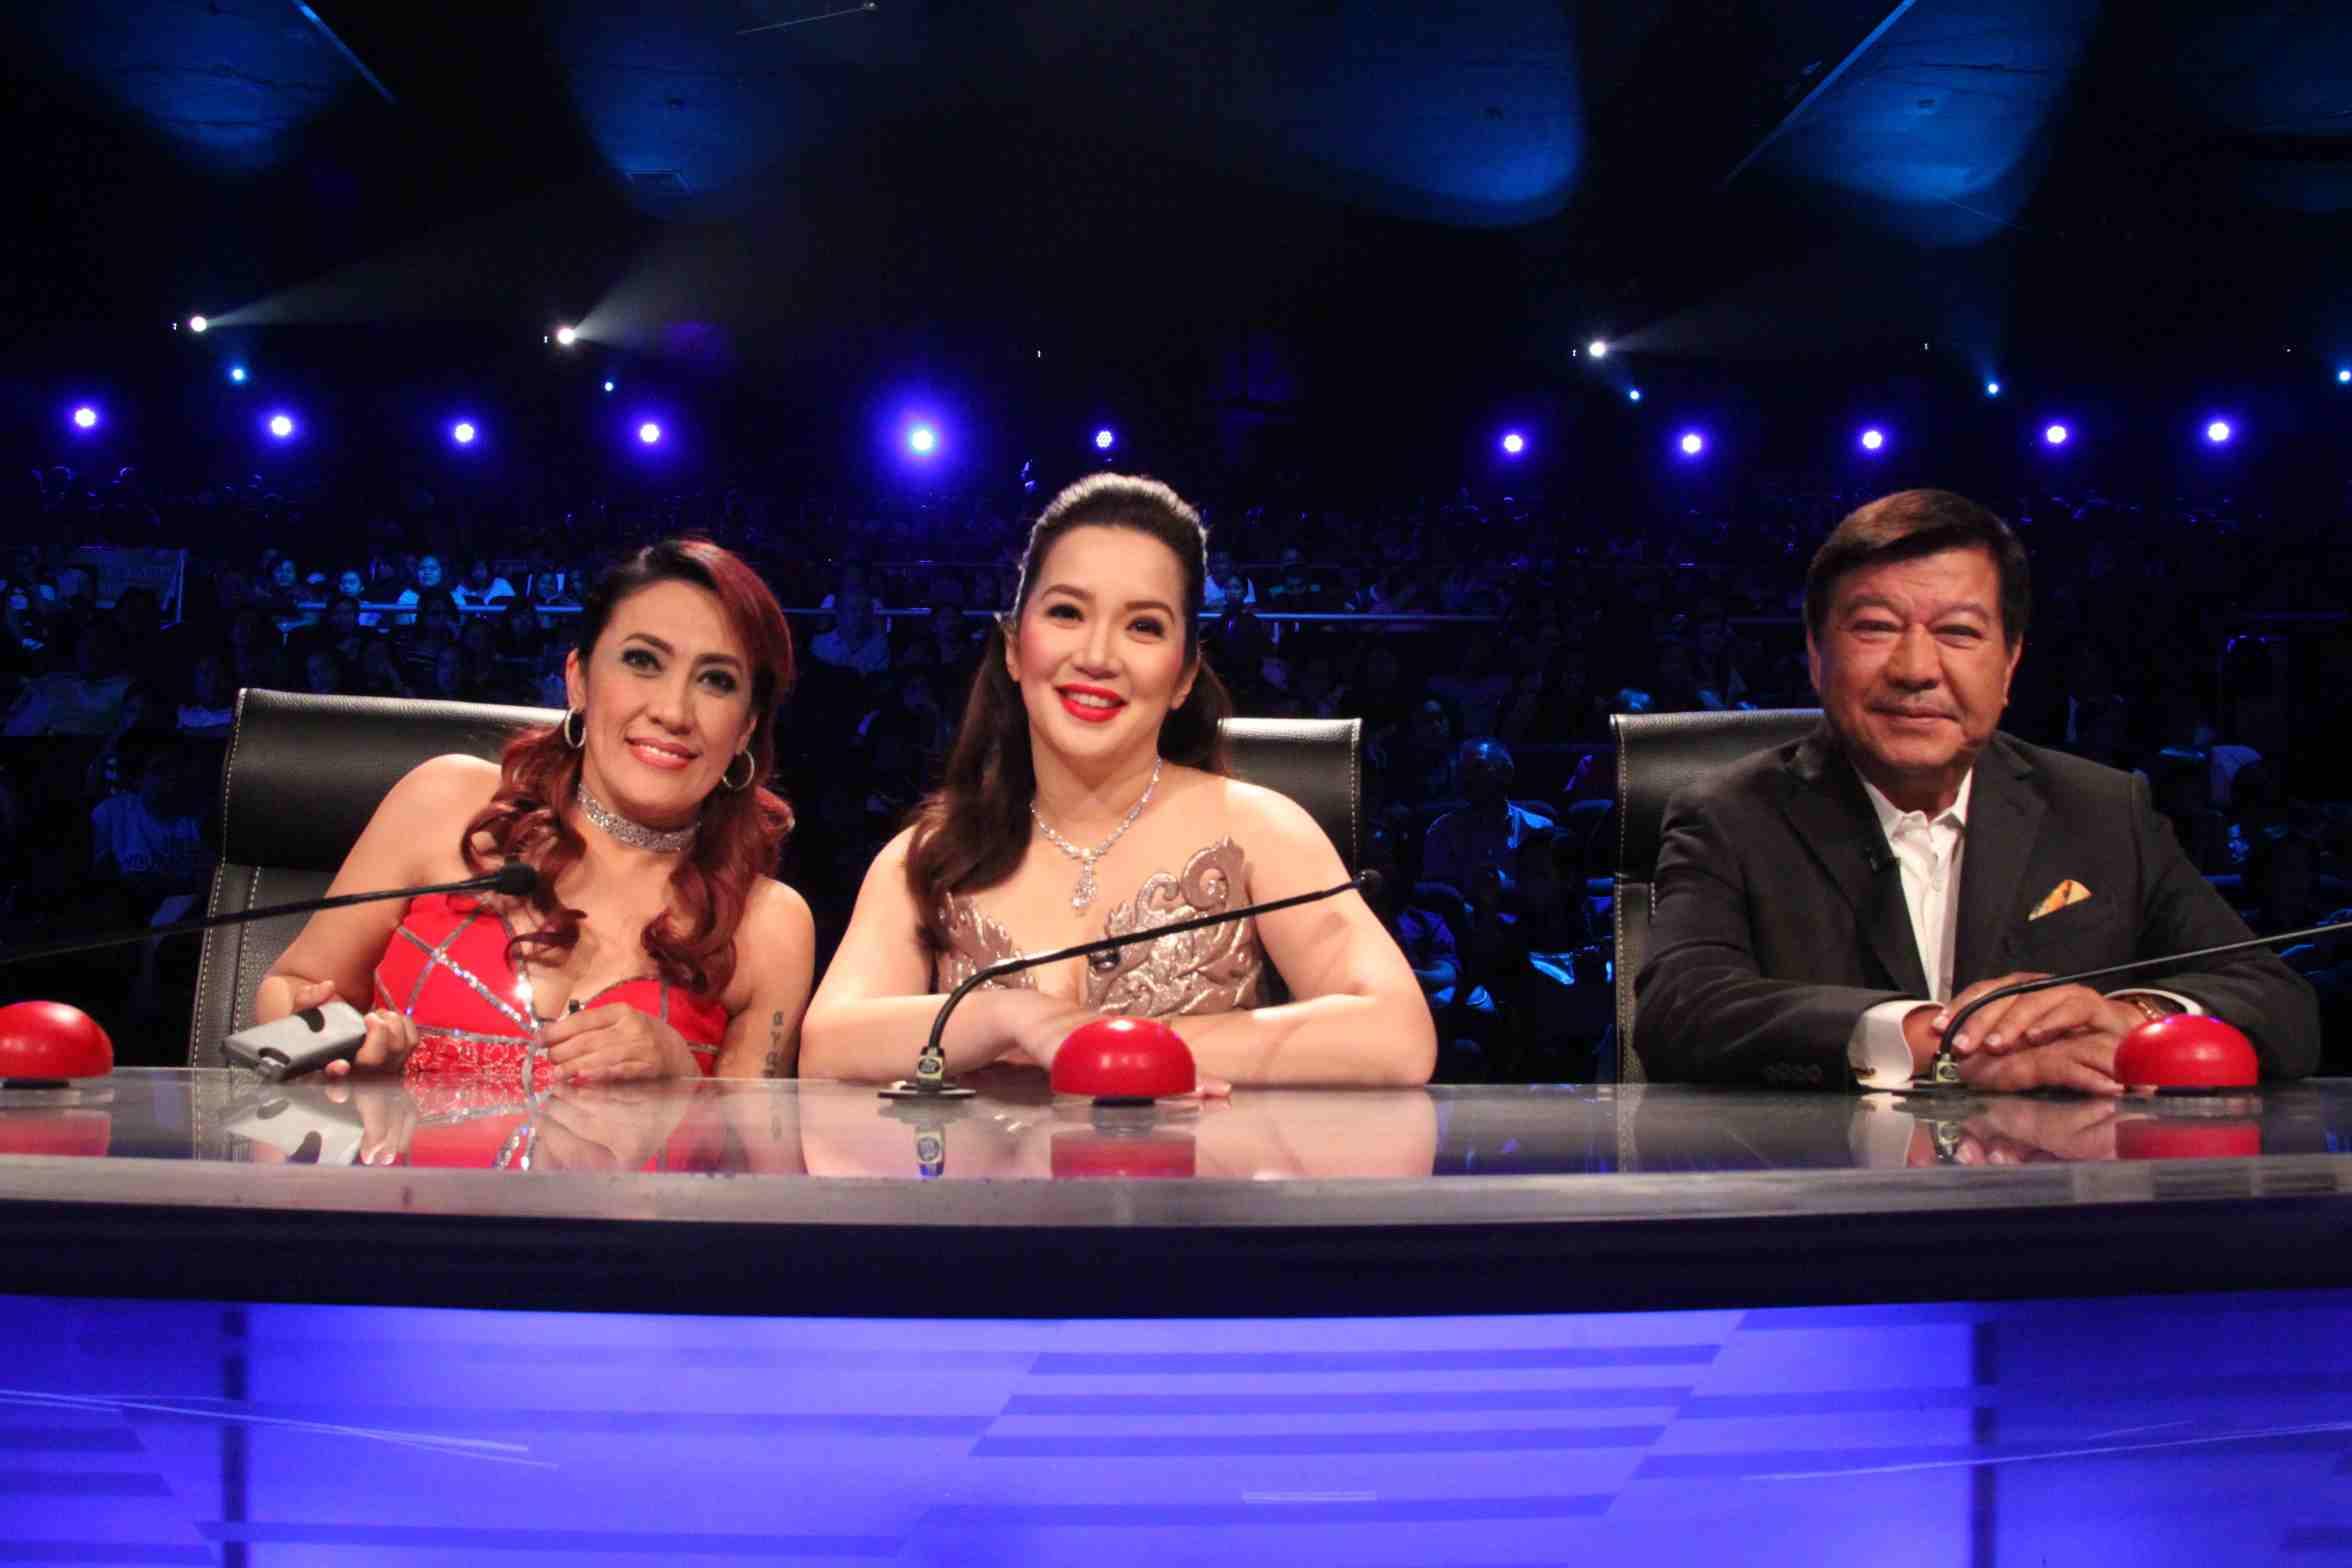 Big three judges Aiai Delas Alas, Kris Aquino, and Freddie Garcia